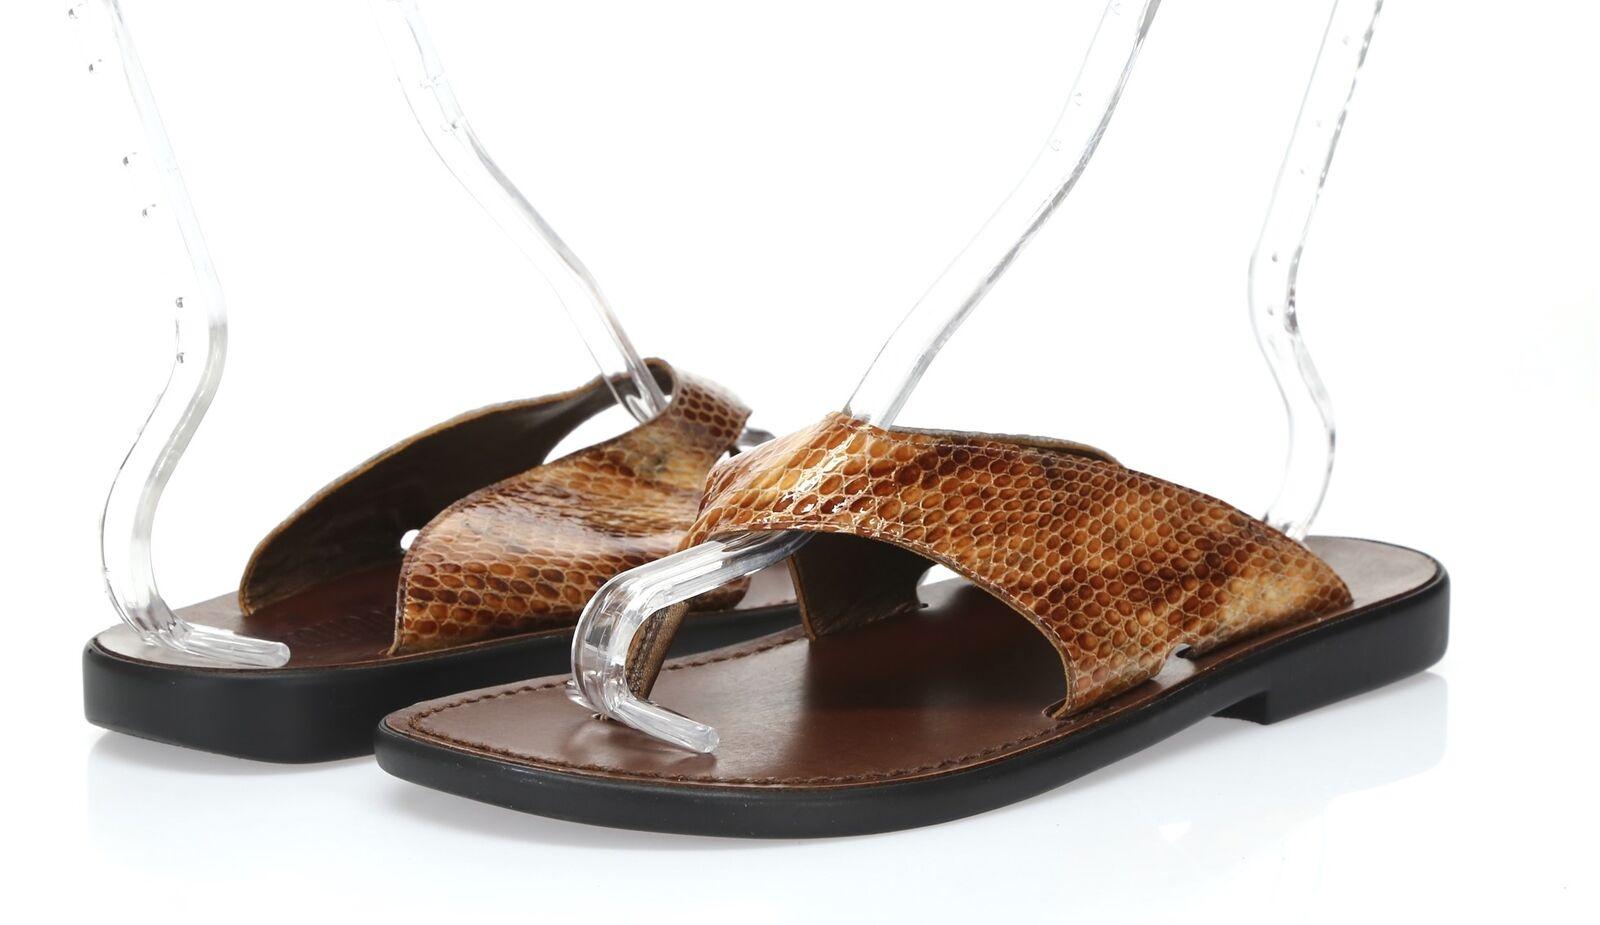 Damenschuhe Munro Braun patent Leder flip flops Sandale sz. 11 W